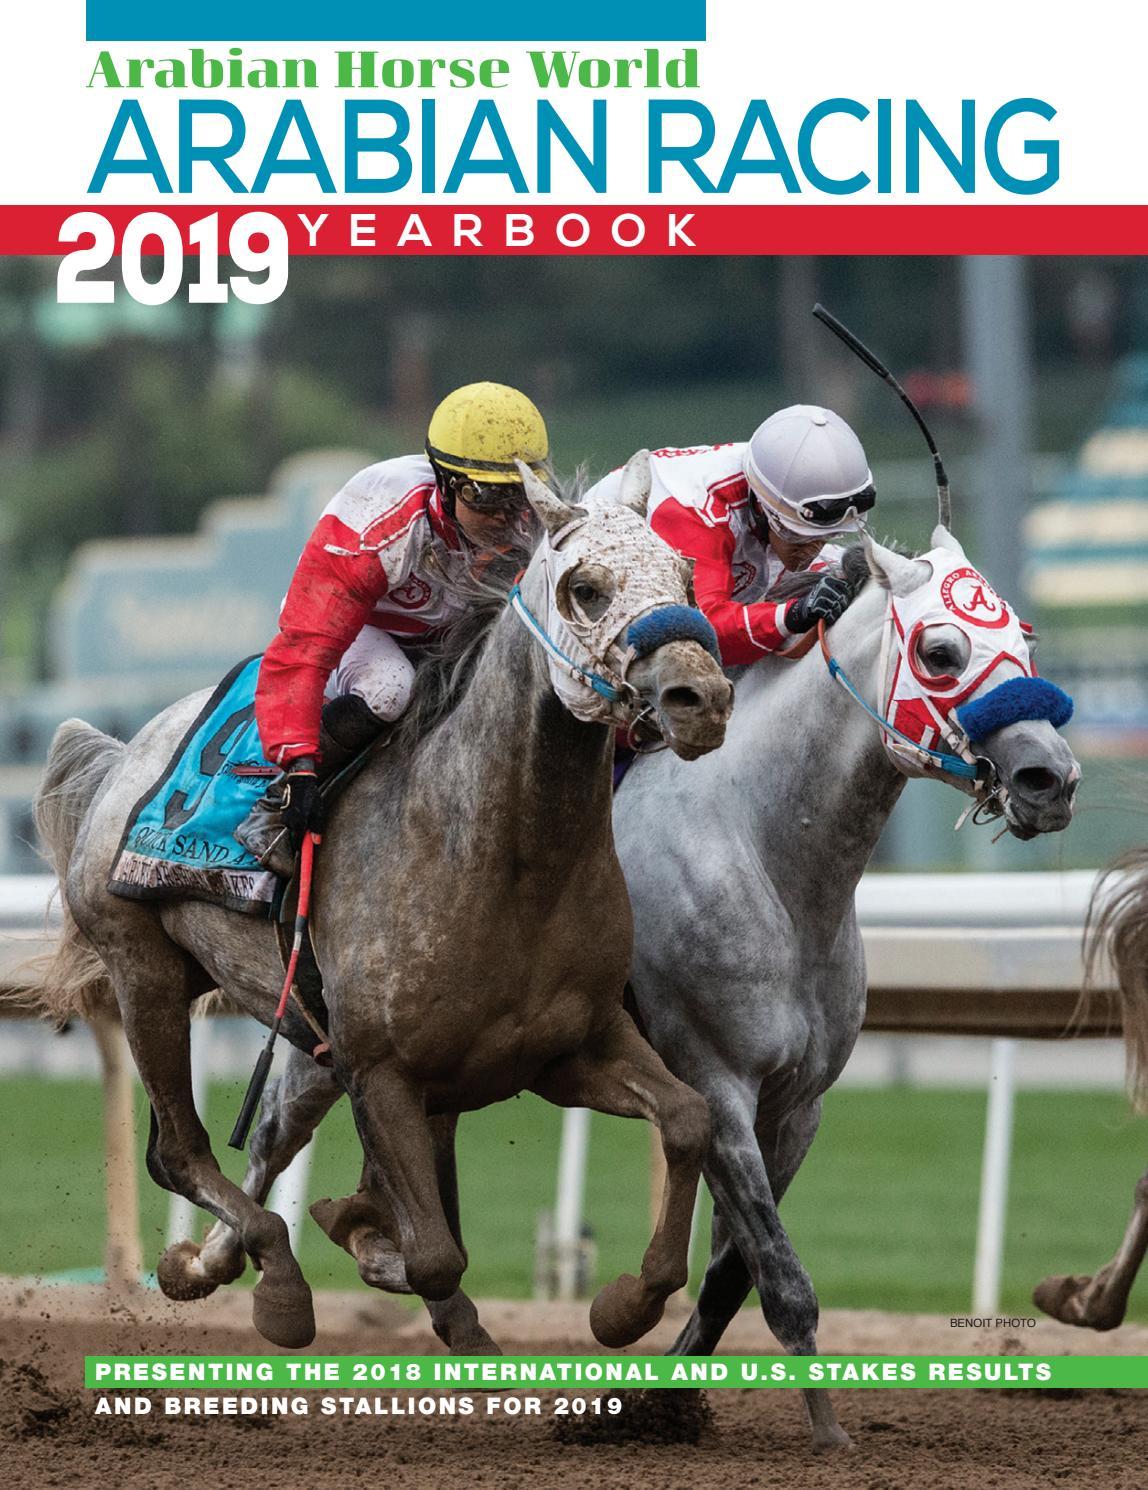 2019 Arabian Racing Yearbook By Arabian Horse World Issuu